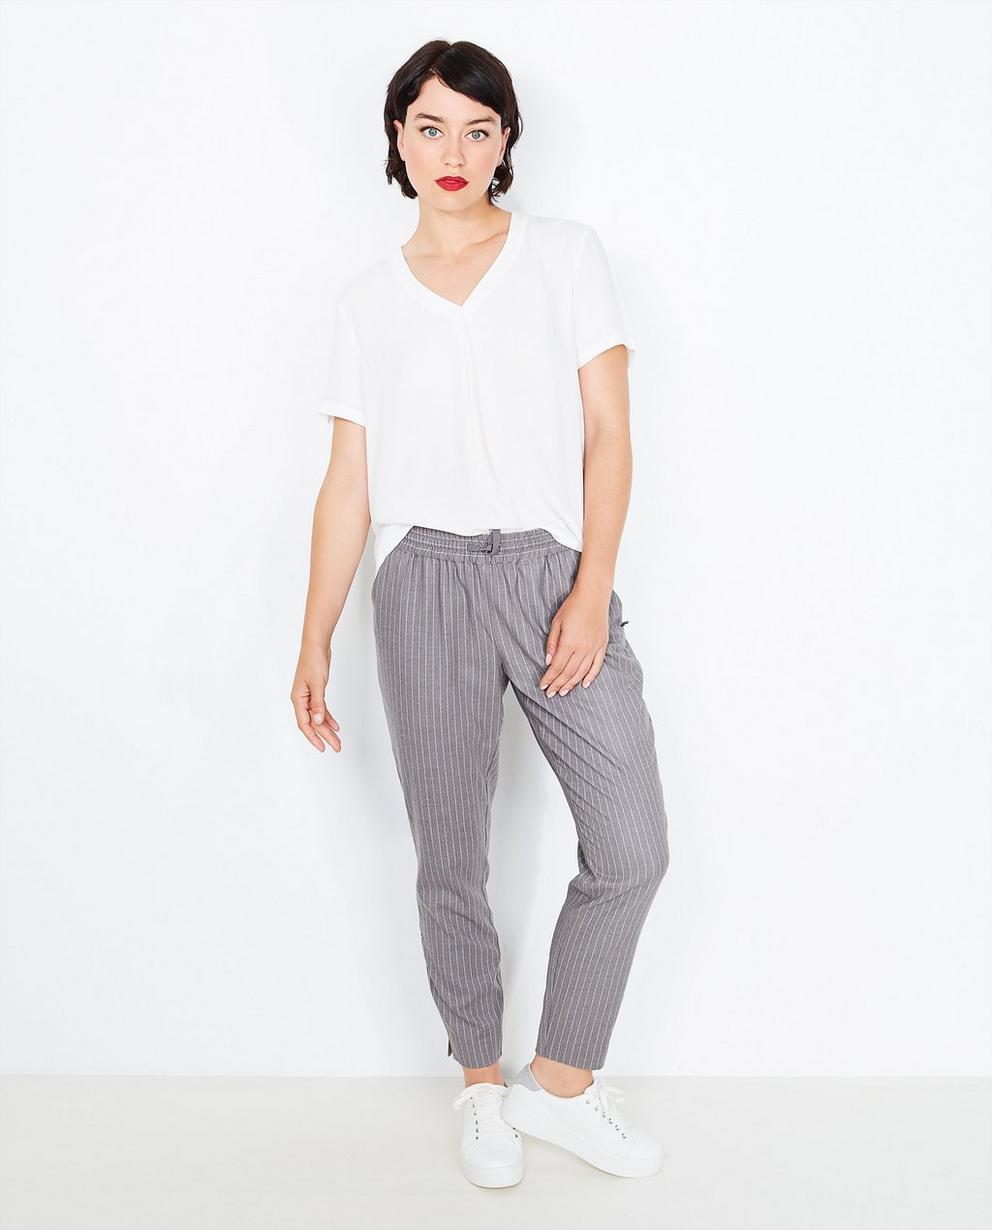 Roomwitte blouse met kant - lichtjes oversized - Sora